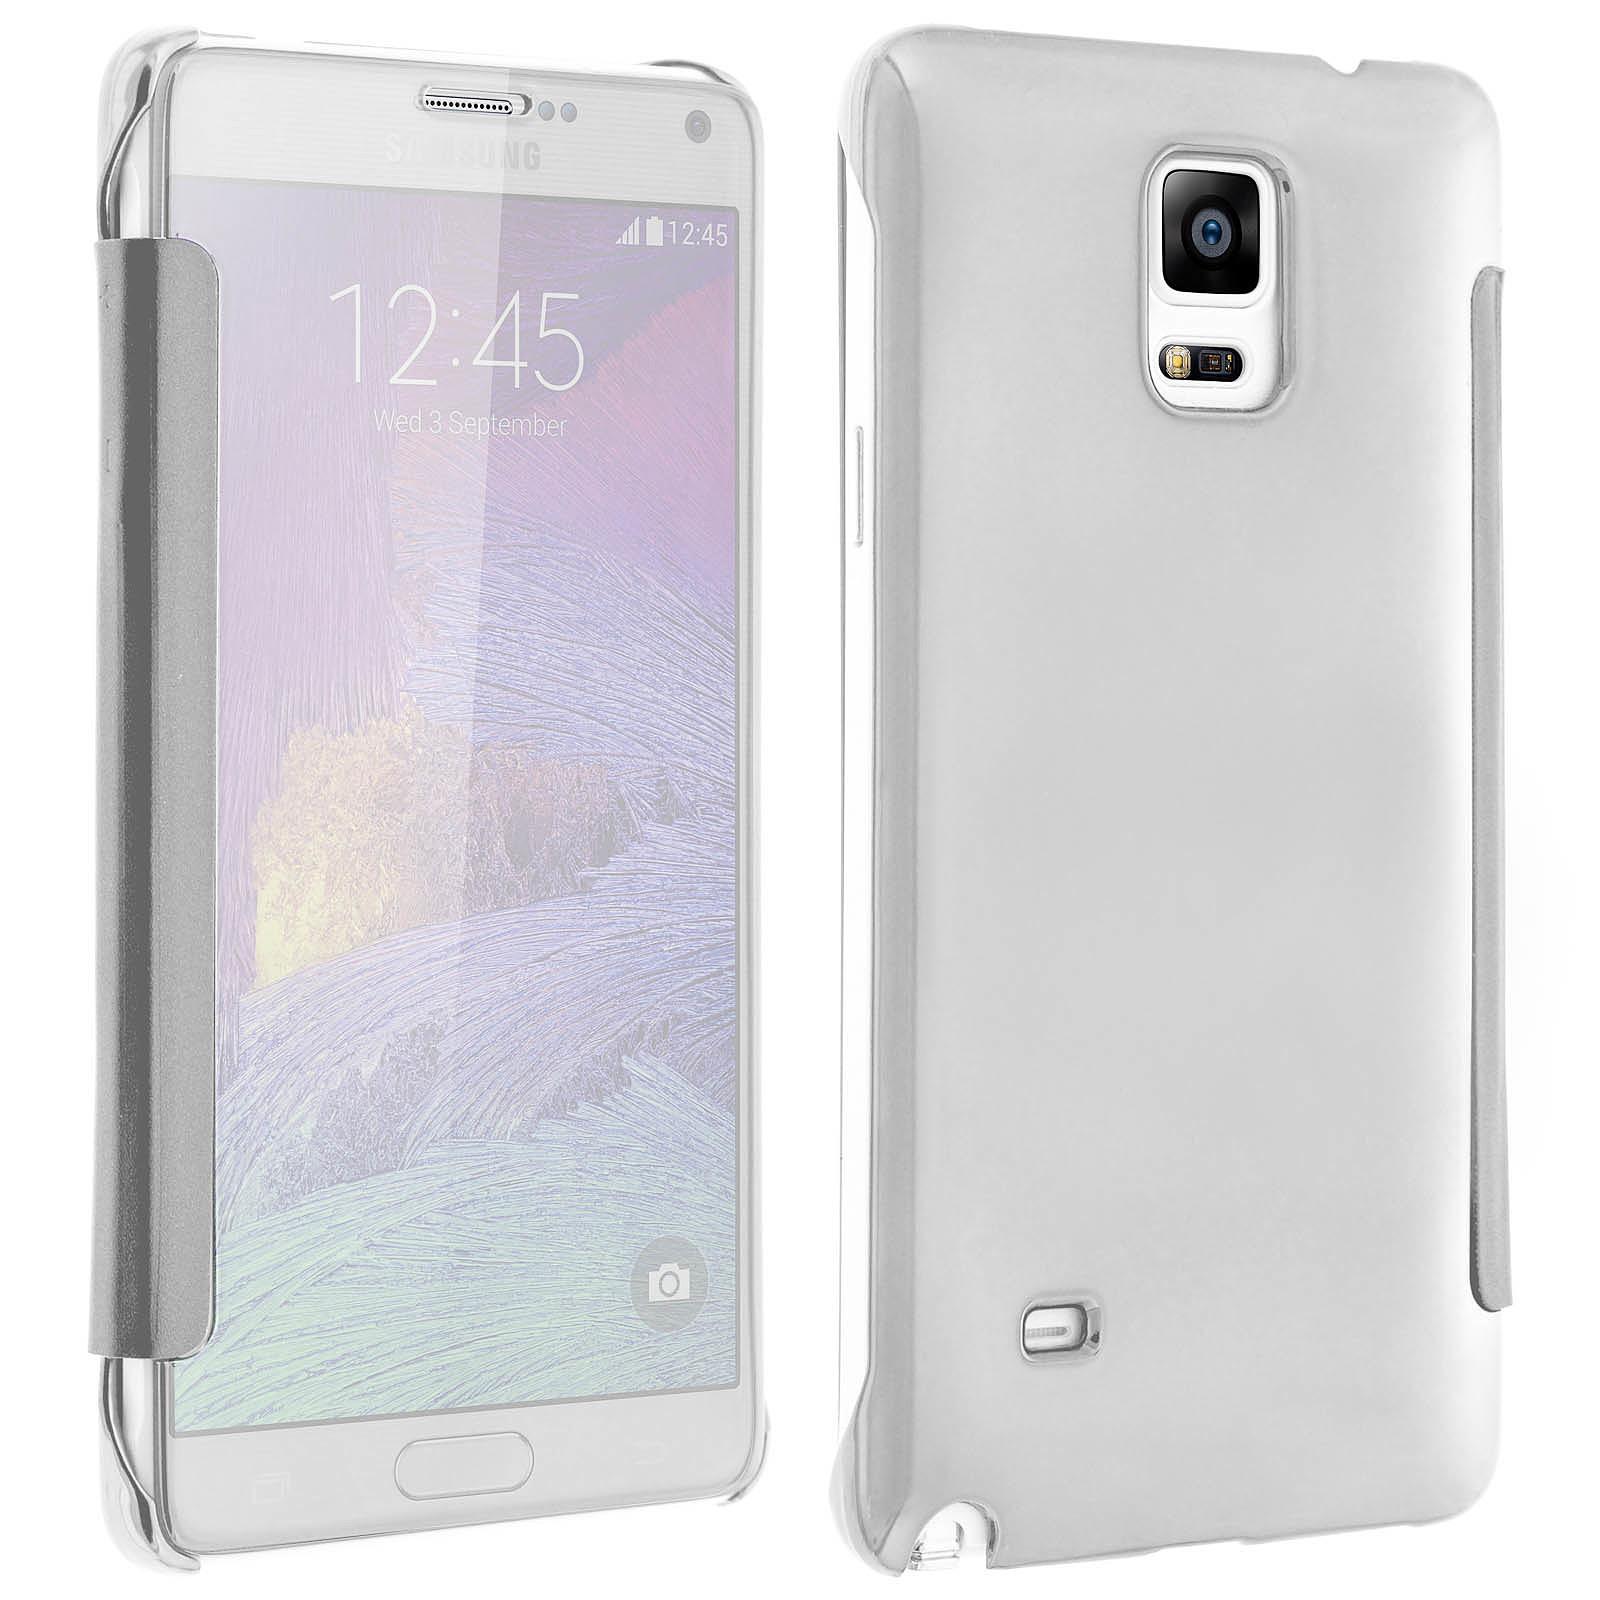 Avizar Etui folio Argent pour Samsung Galaxy Note 4